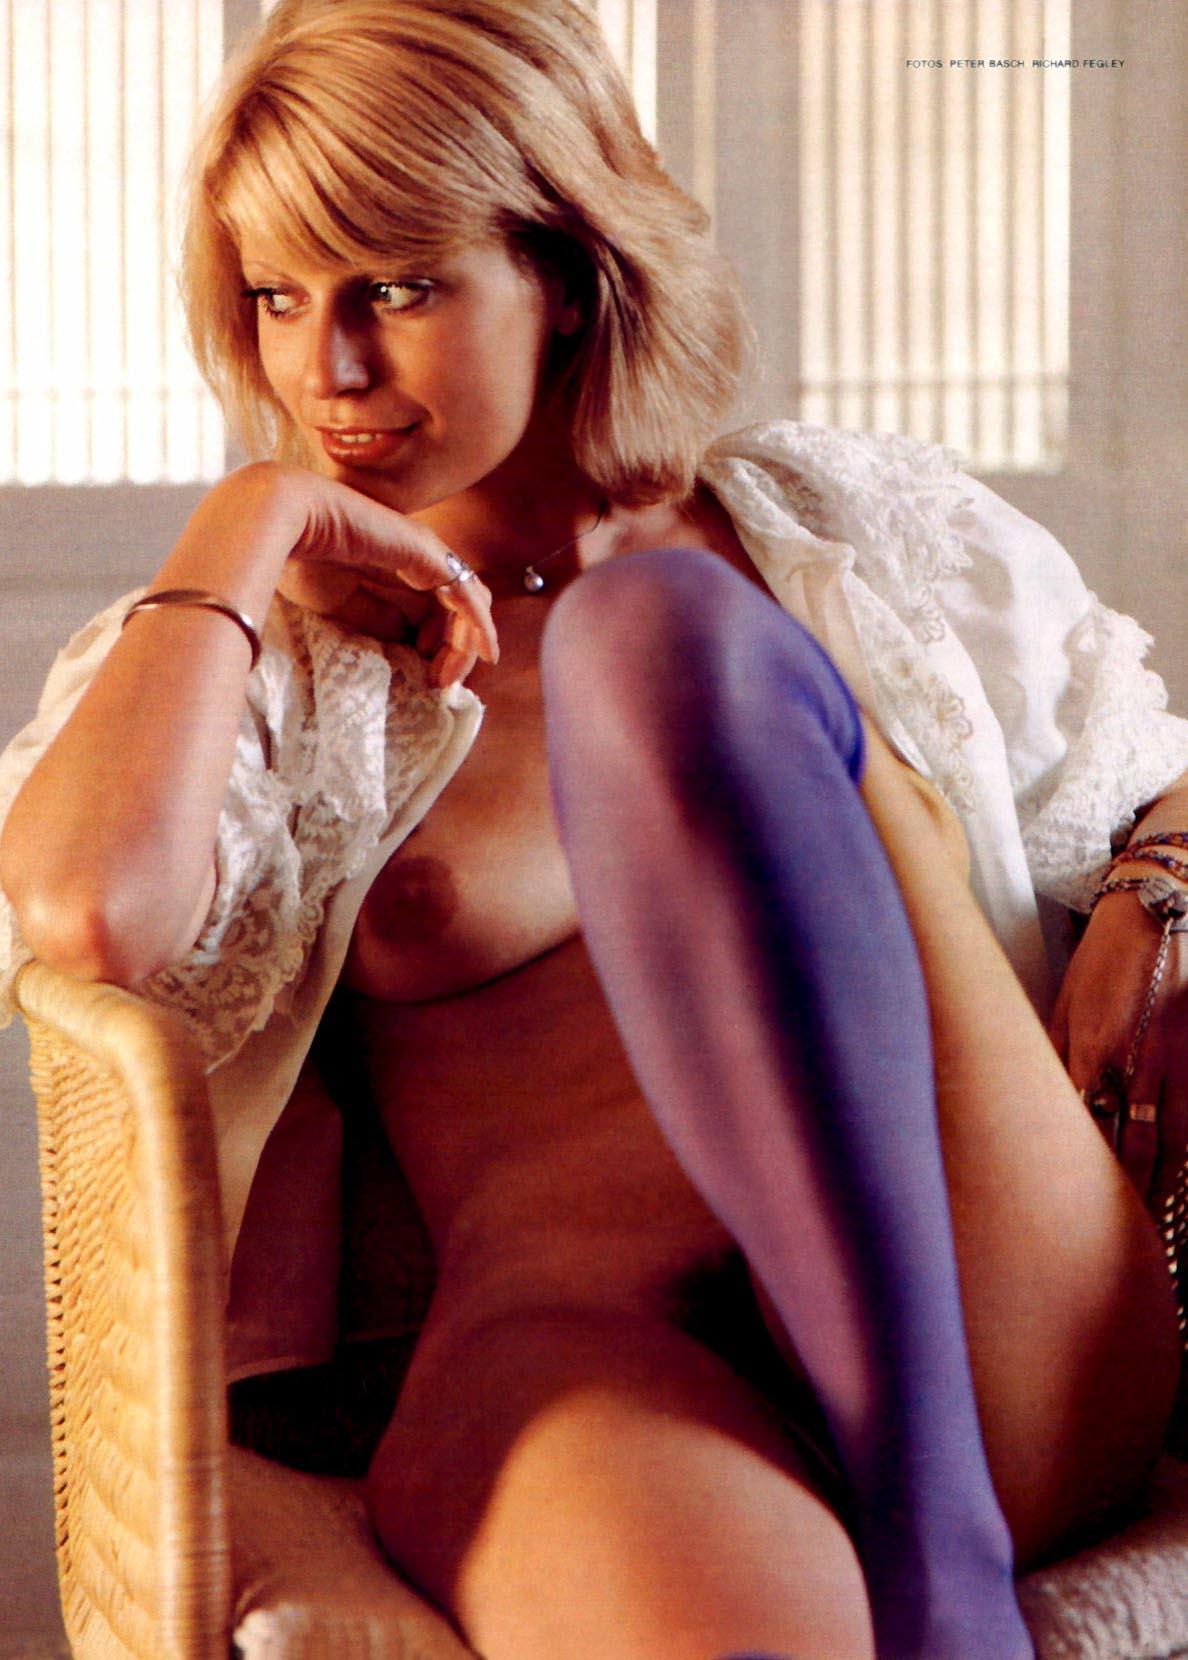 Кристиана Крюгер голая. Фото - 2